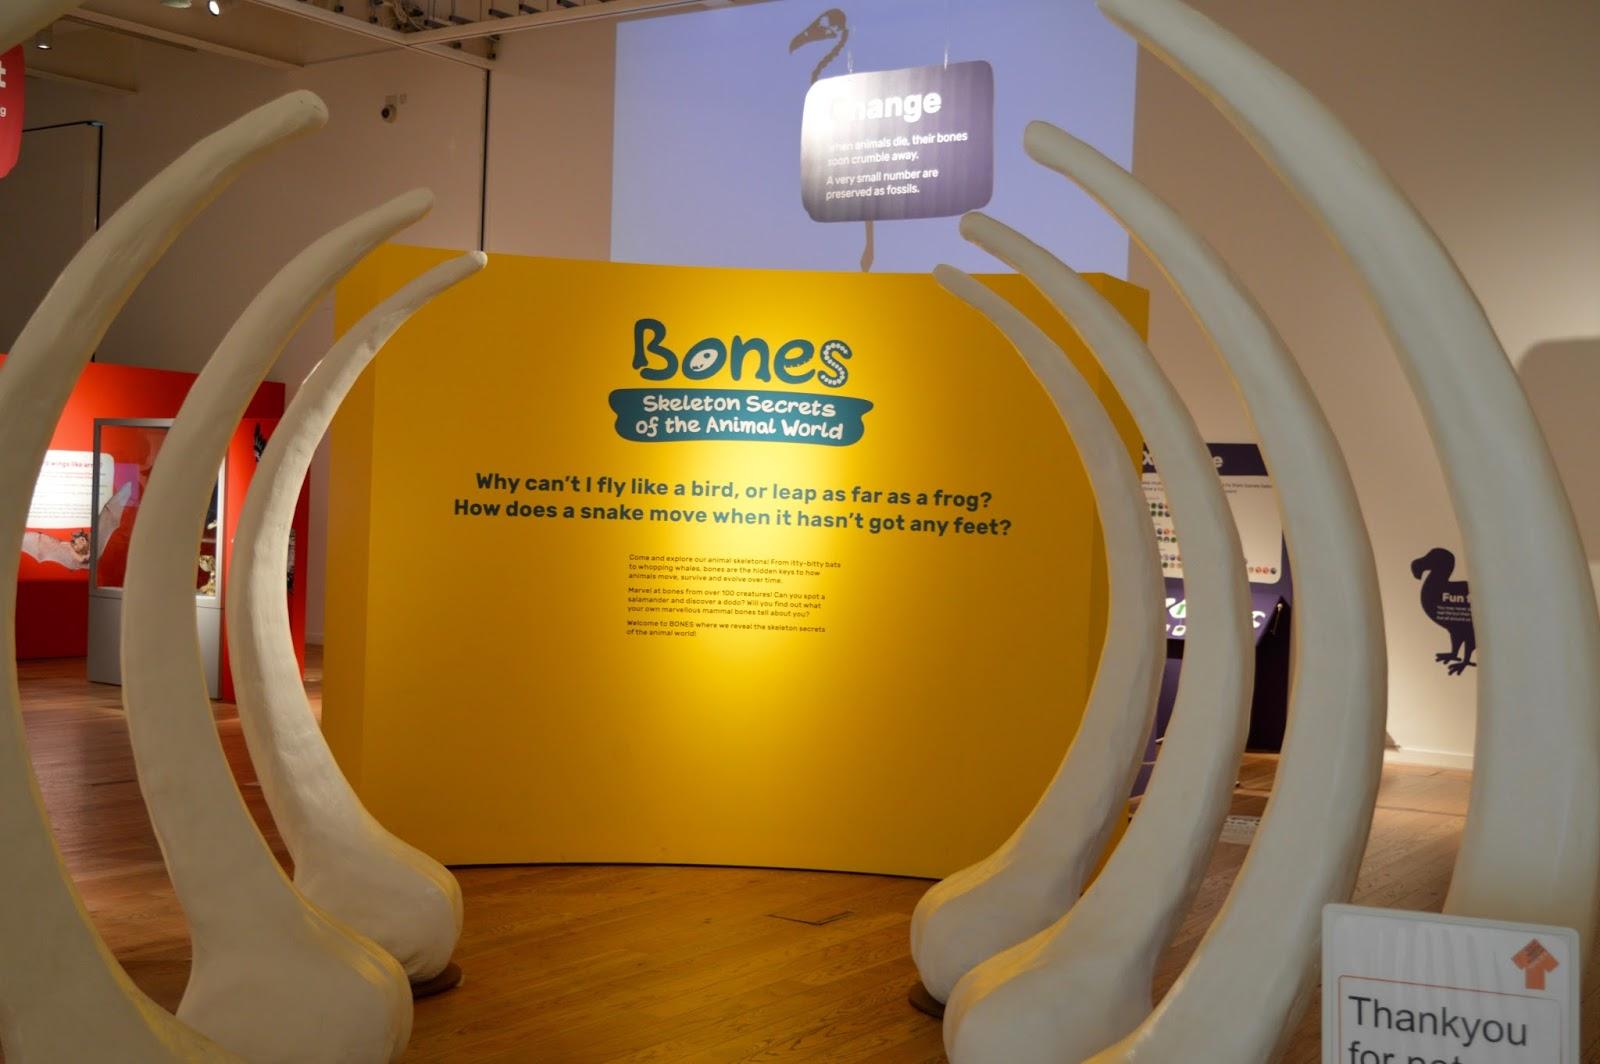 Bones Exhibition at Hancock Museum, Newcastle | whale ribs